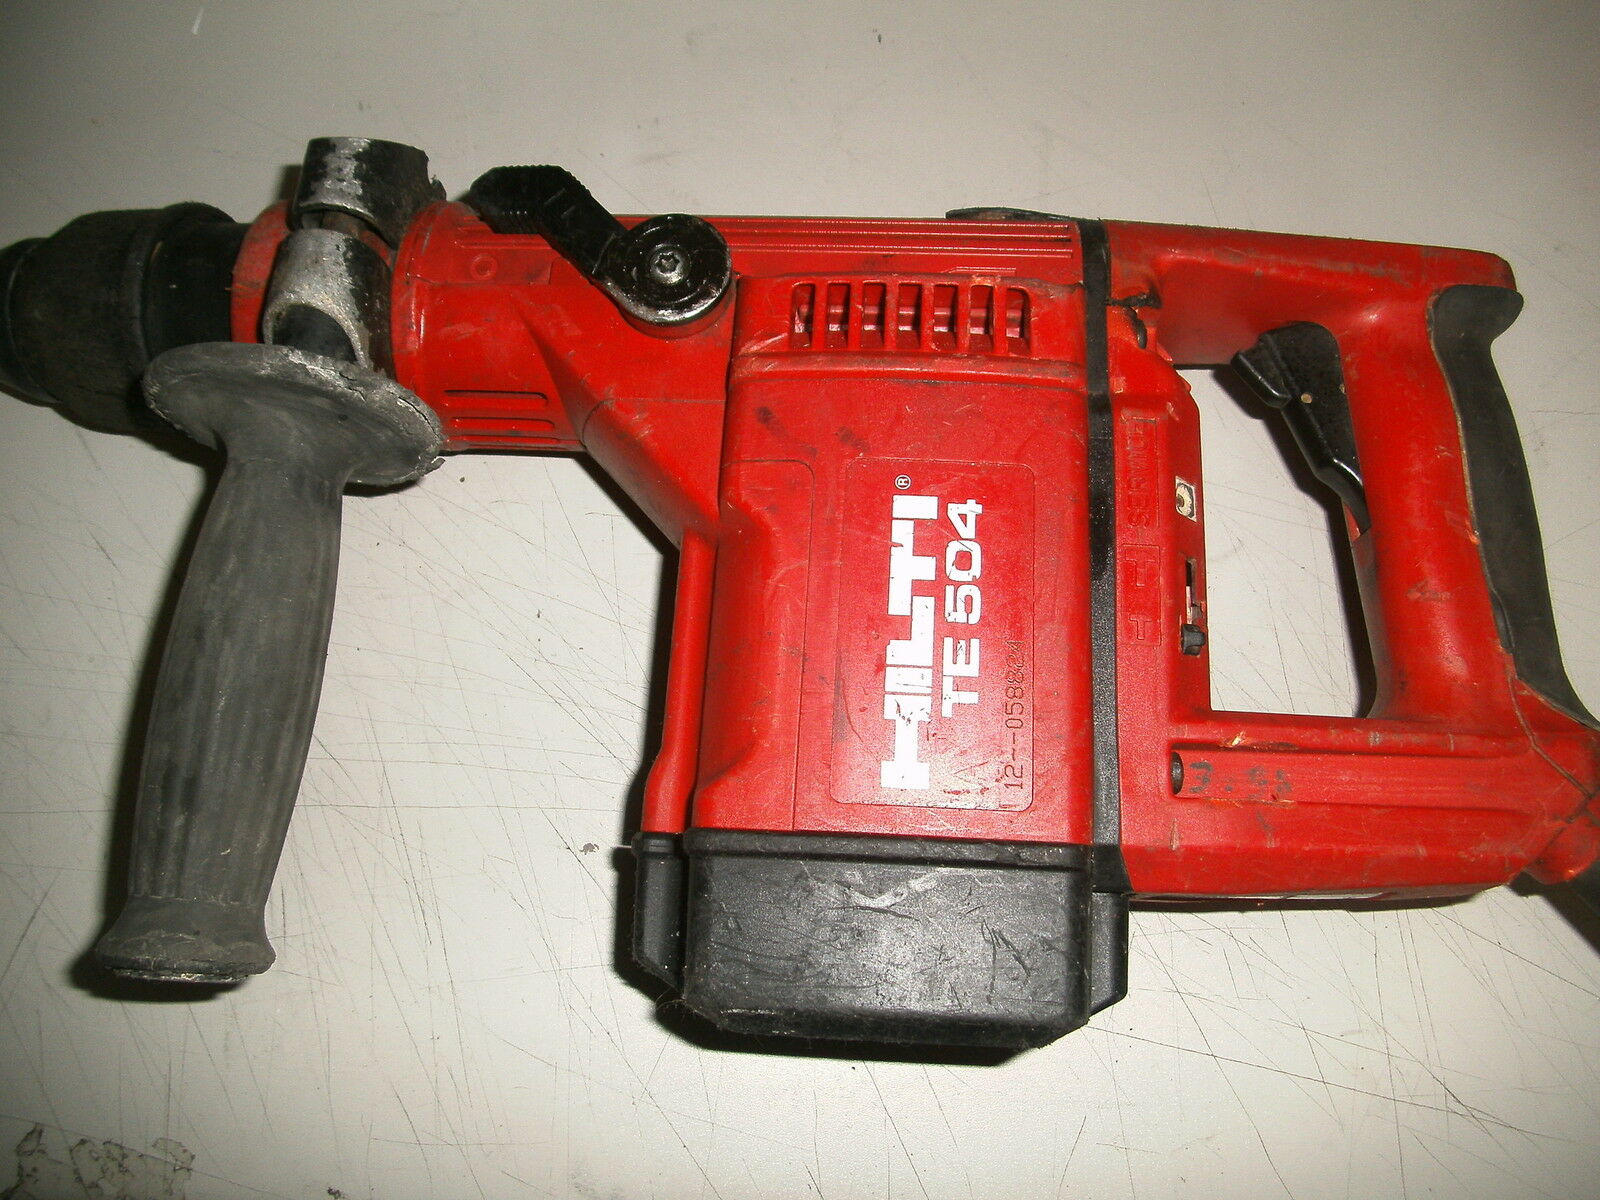 Reparatur Meißelhammer Hilti TE 504